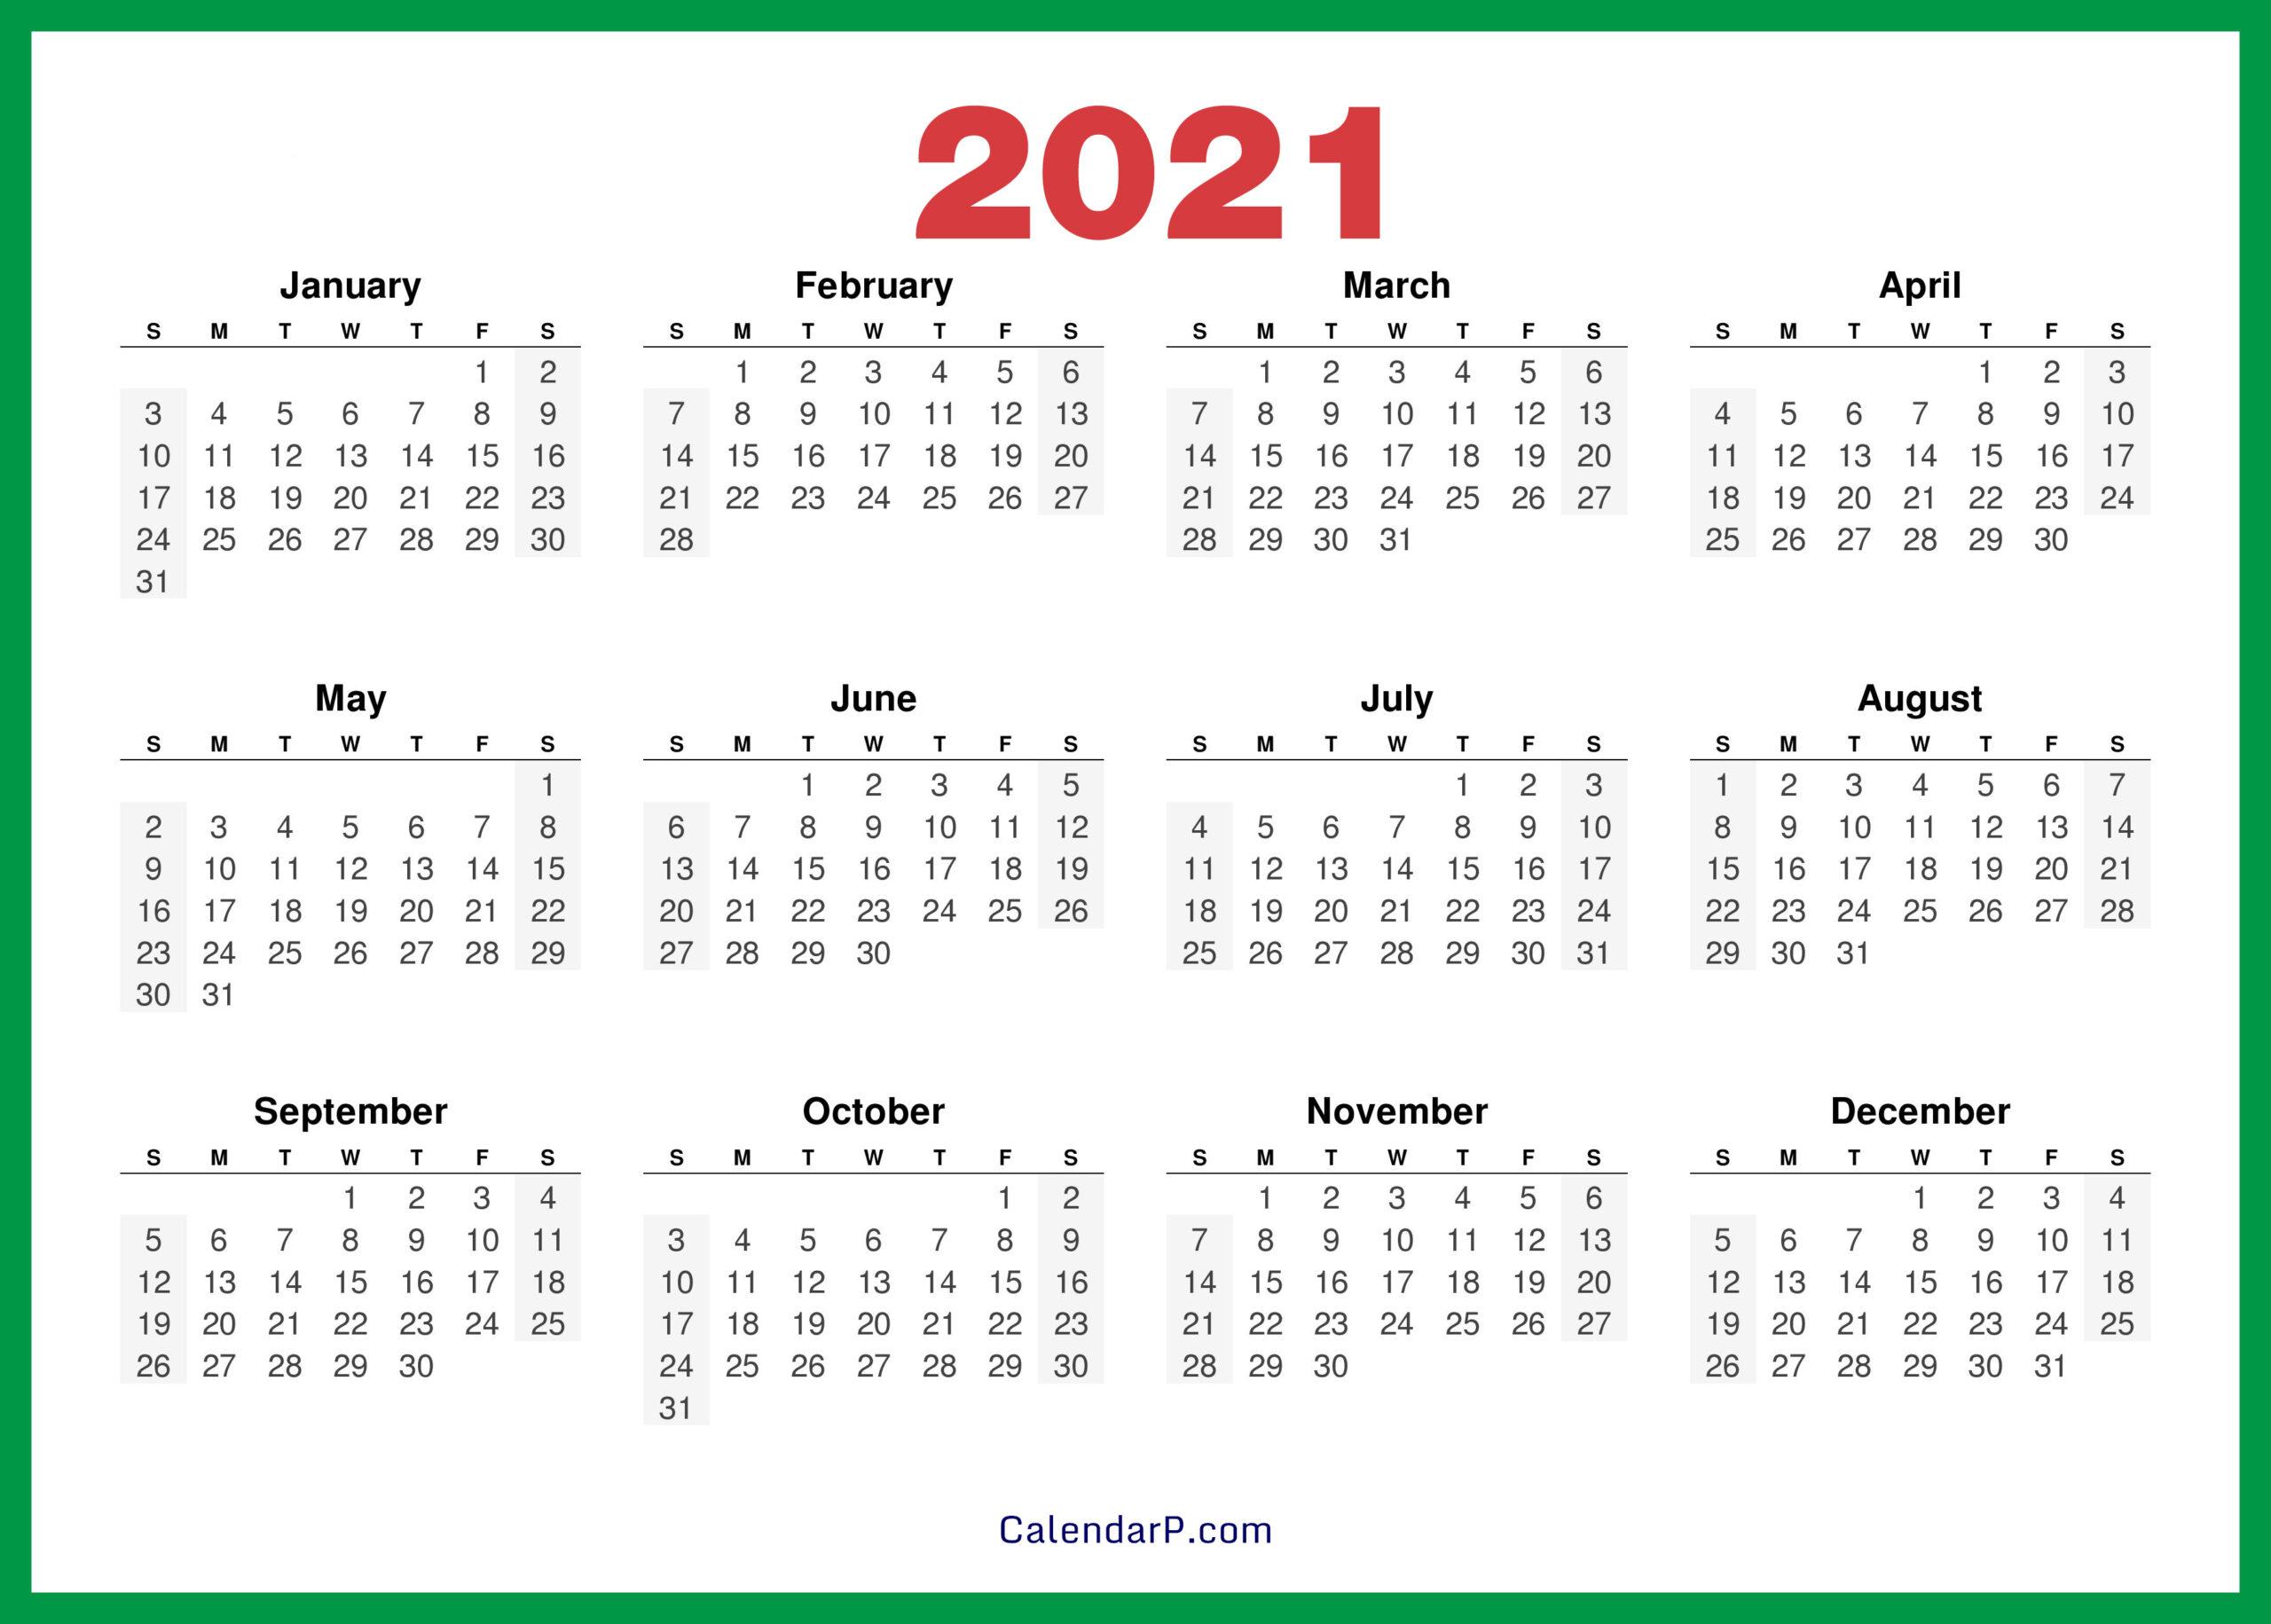 2021 Calendar Printable Free Hd - Green - Calendarp